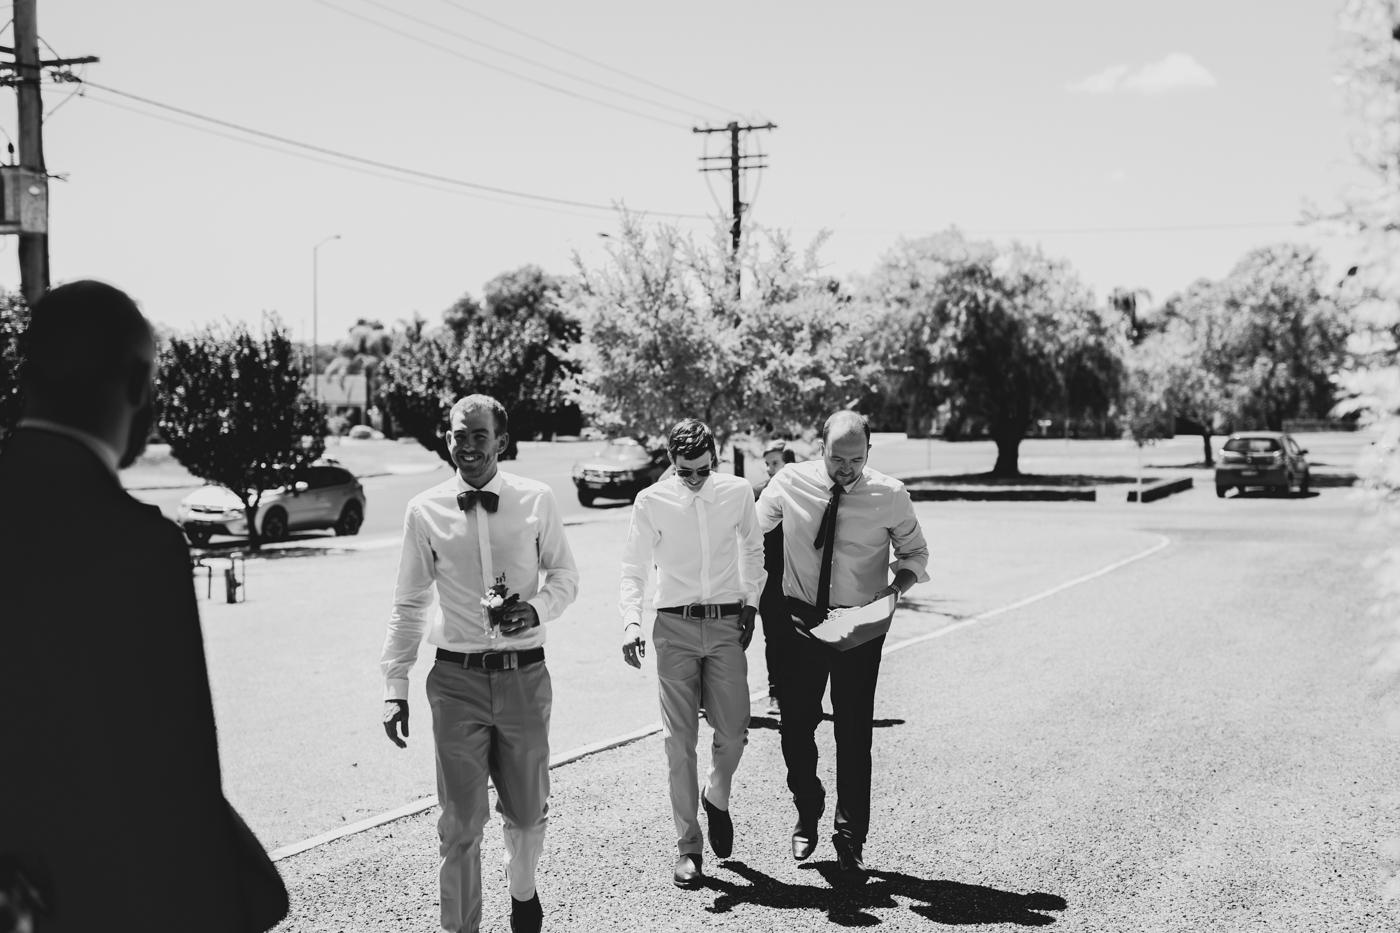 Nicolle & Jacob - Dubbo Wedding - Country Australia - Samantha Heather Photography-82.jpg